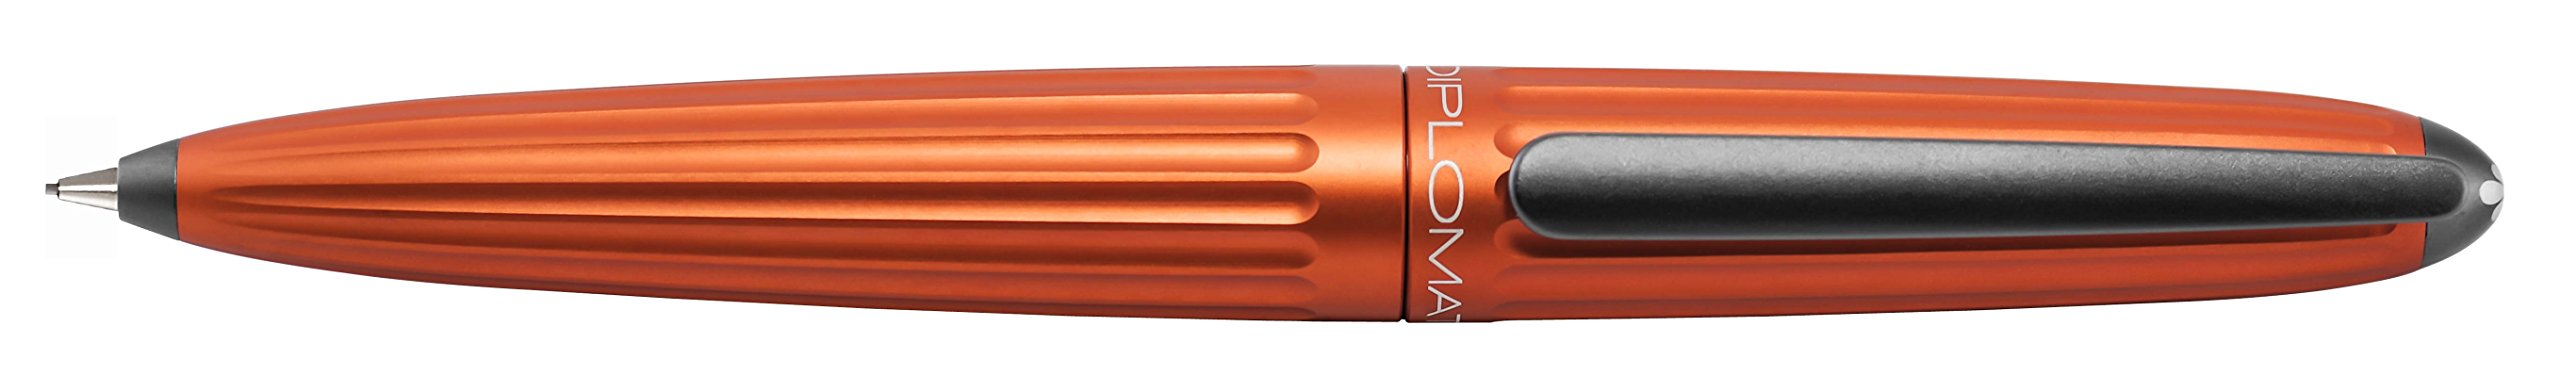 Diplomat AERO orange, mechanical pencil 0,7mm HB